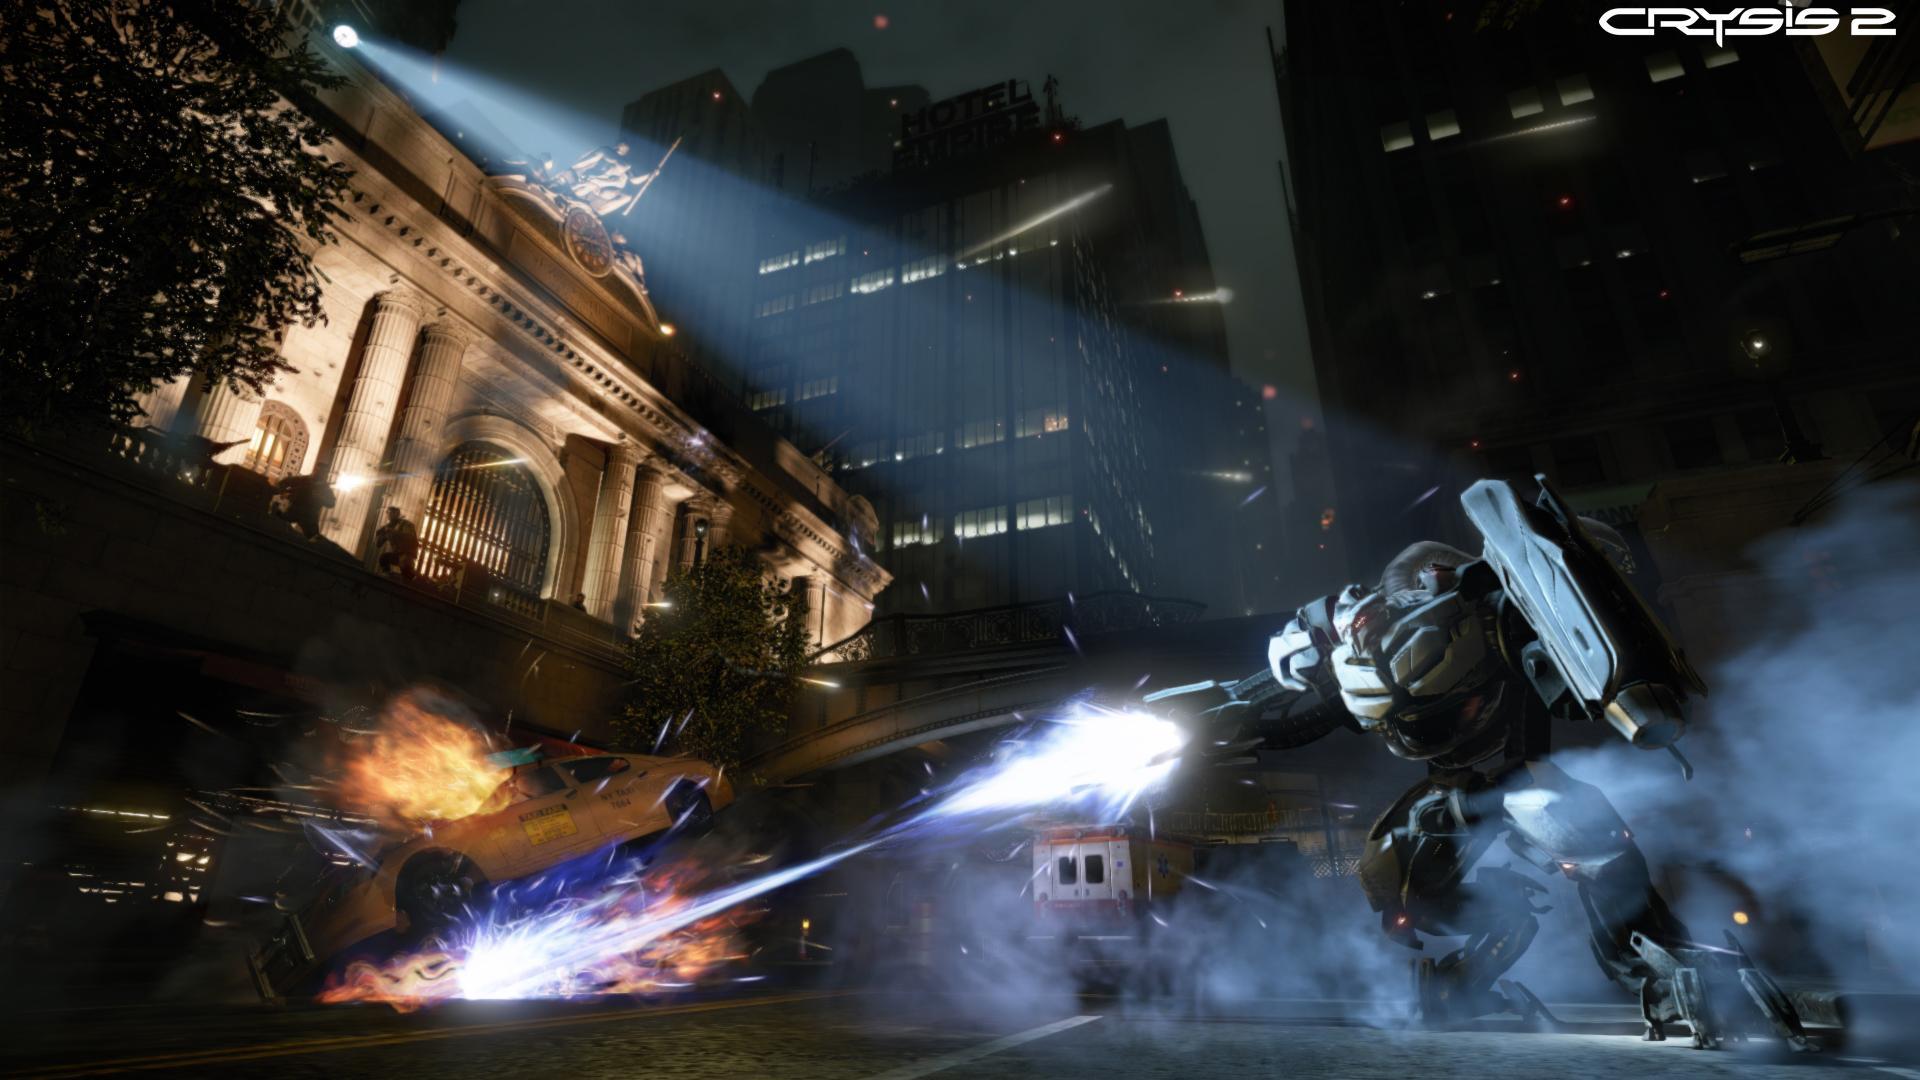 Dojmy z GamesComu - Medal of Honor, Crysis 2 a Dead Space 2 5720